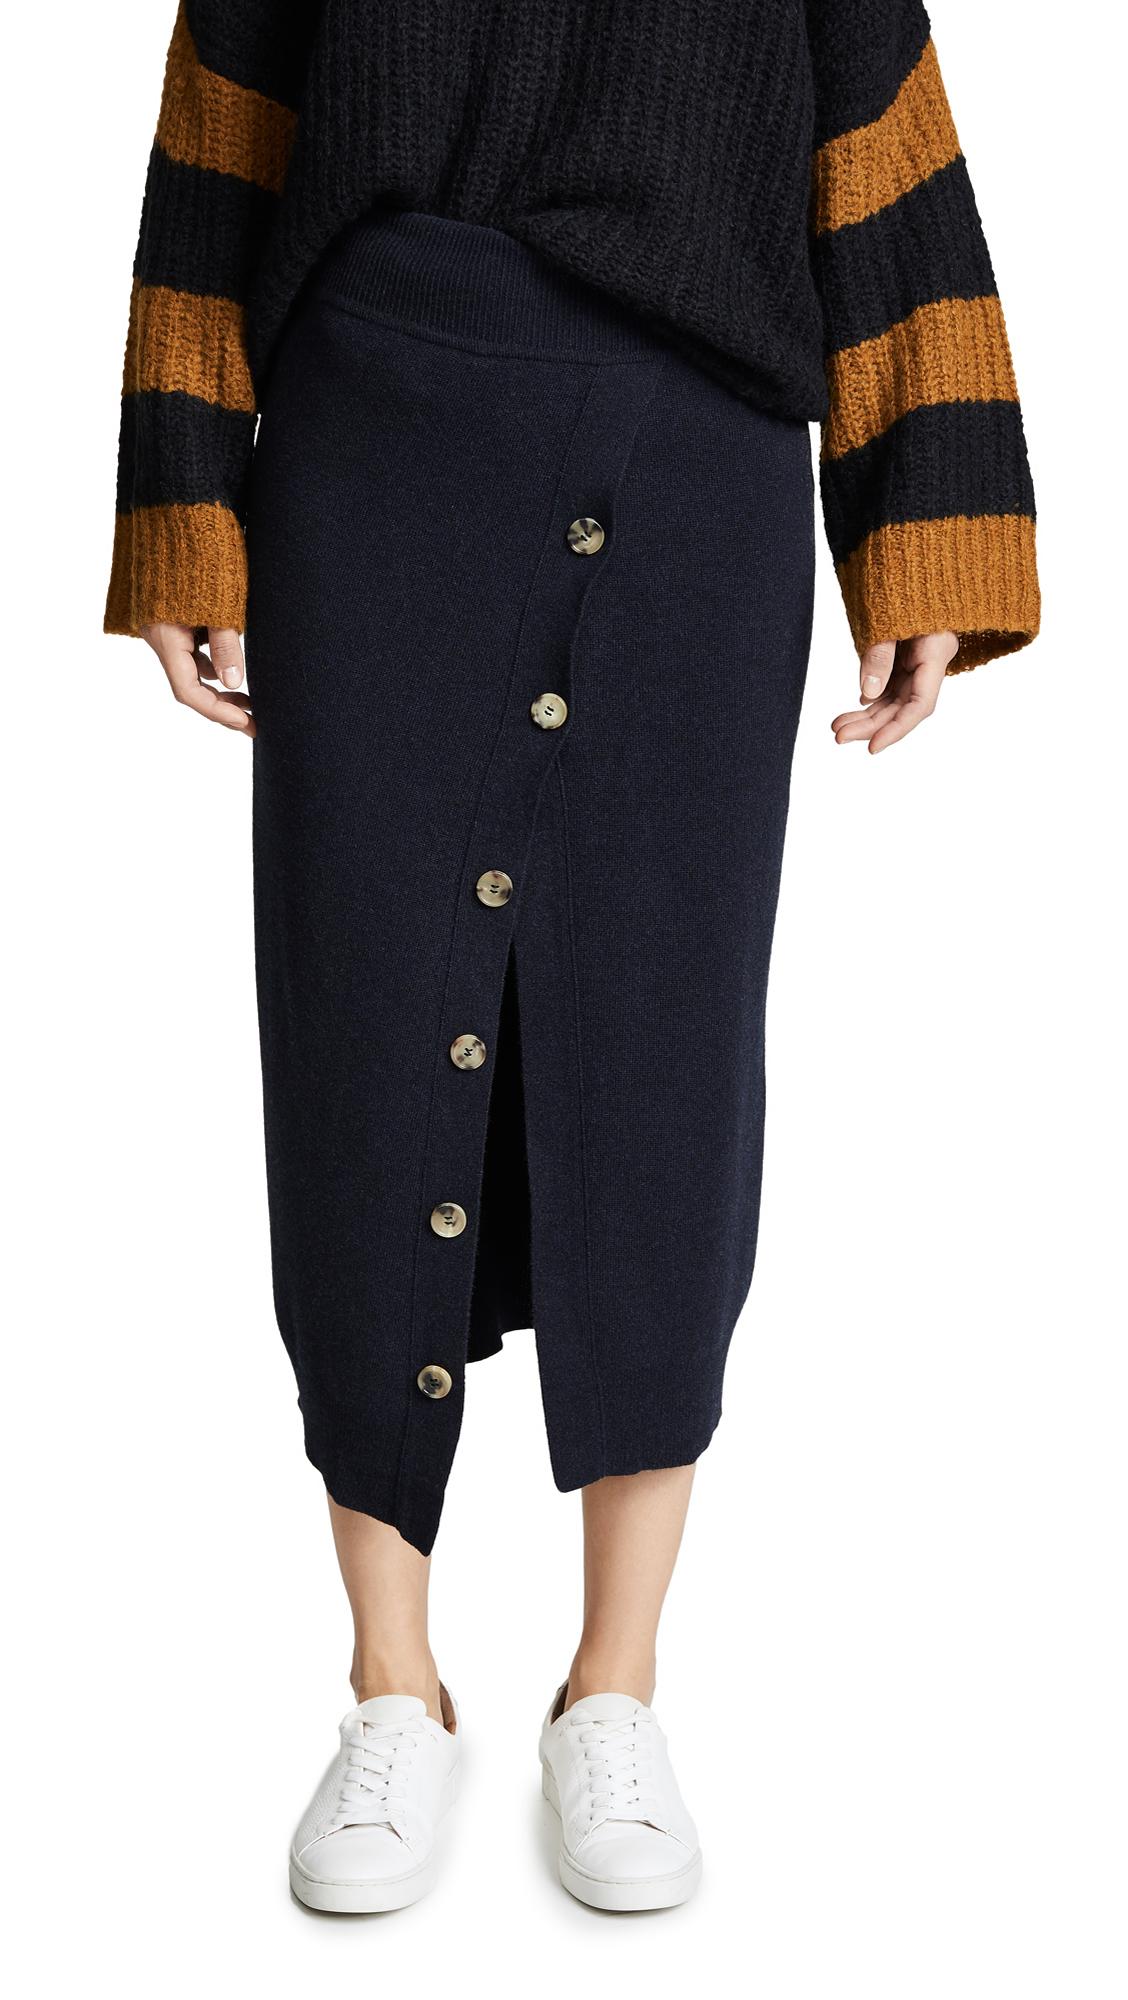 GOEN.J Knit Button Front Skirt In Navy